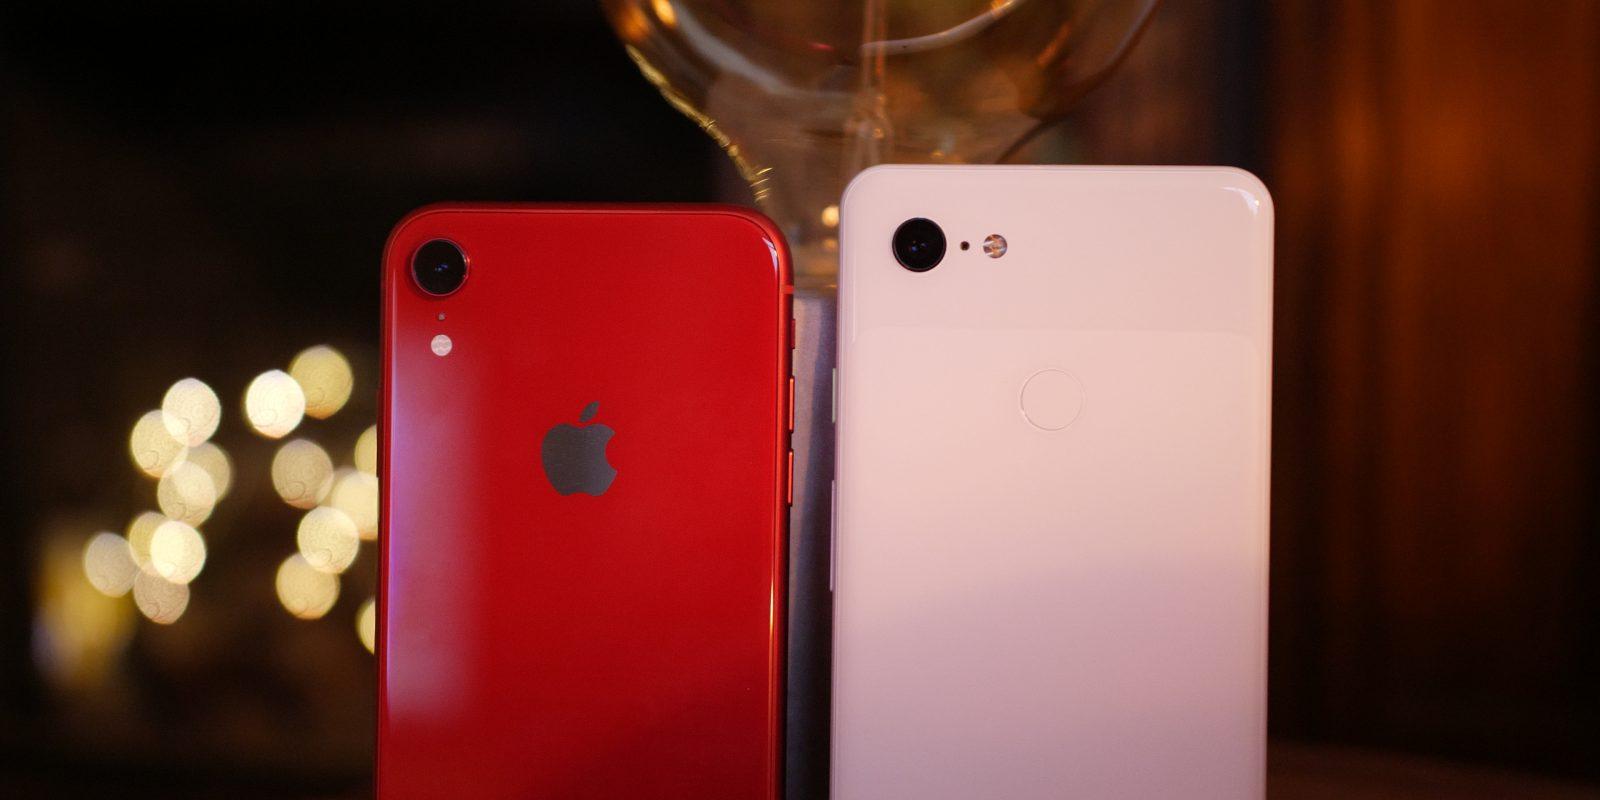 Top Stories: Pixel vs 'Phone X', Gmail Material Theme, more